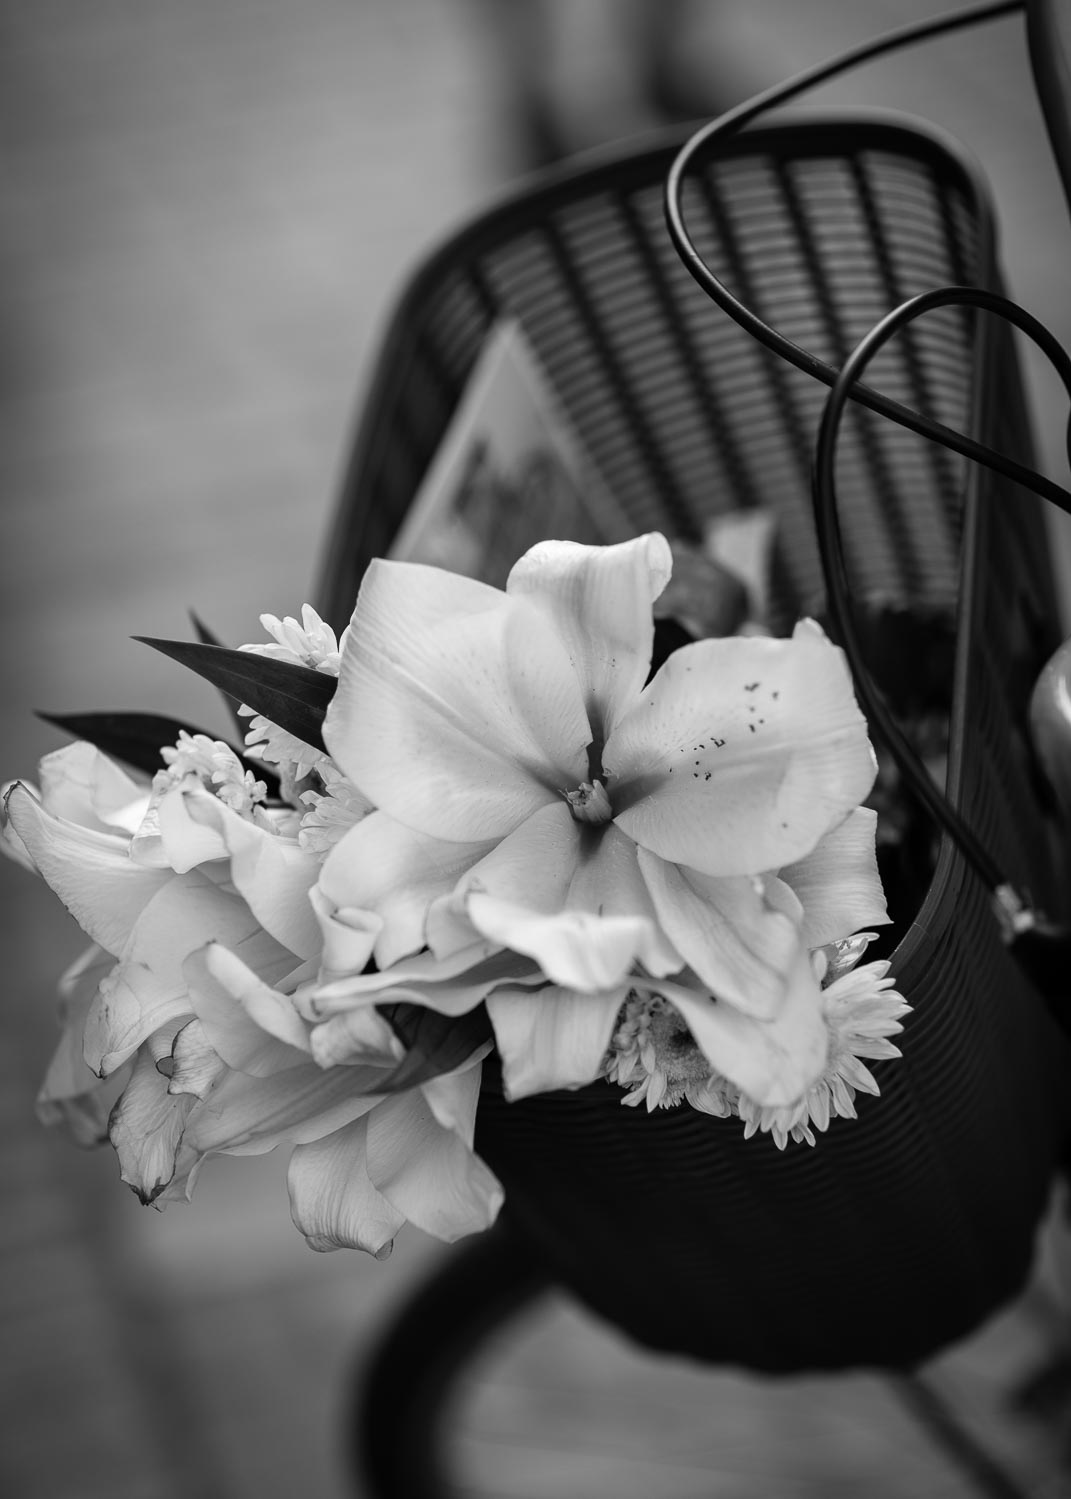 basket-flowers-luang-prabang-tahnia-roberts.jpg